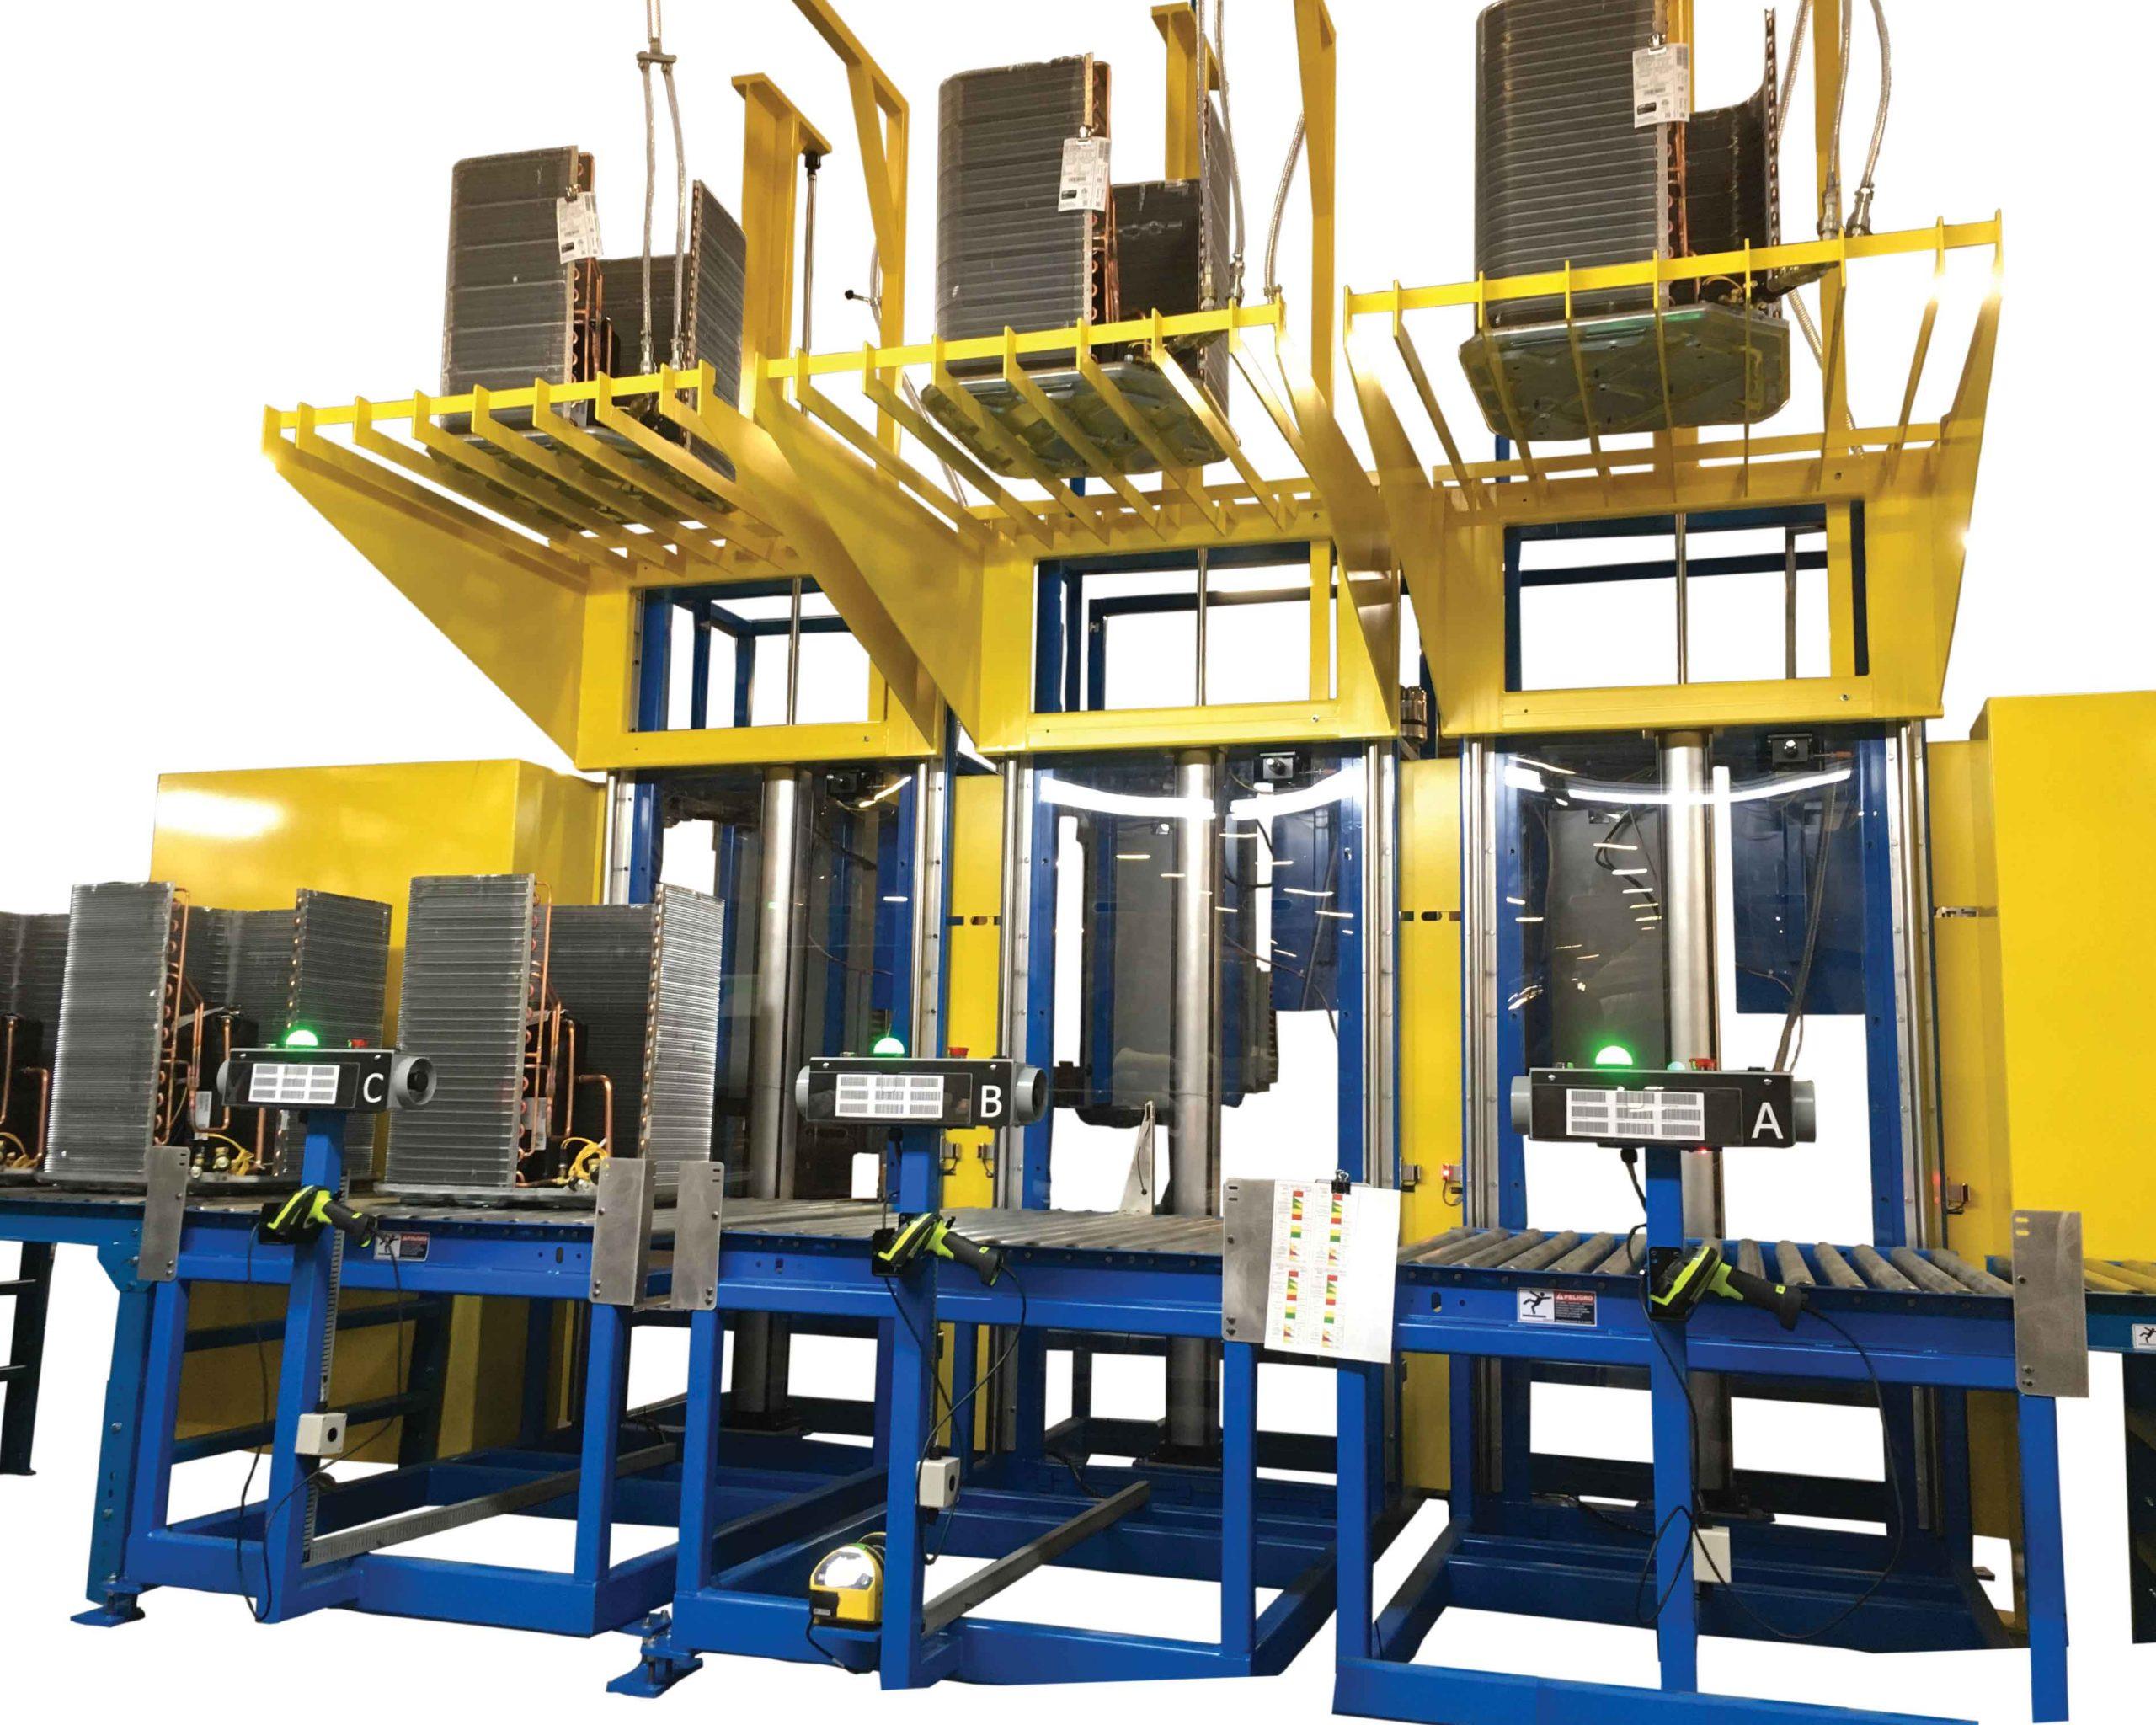 VTI's Evacuation Elevators for Condensing Unit and Heat Pump Manufacturing